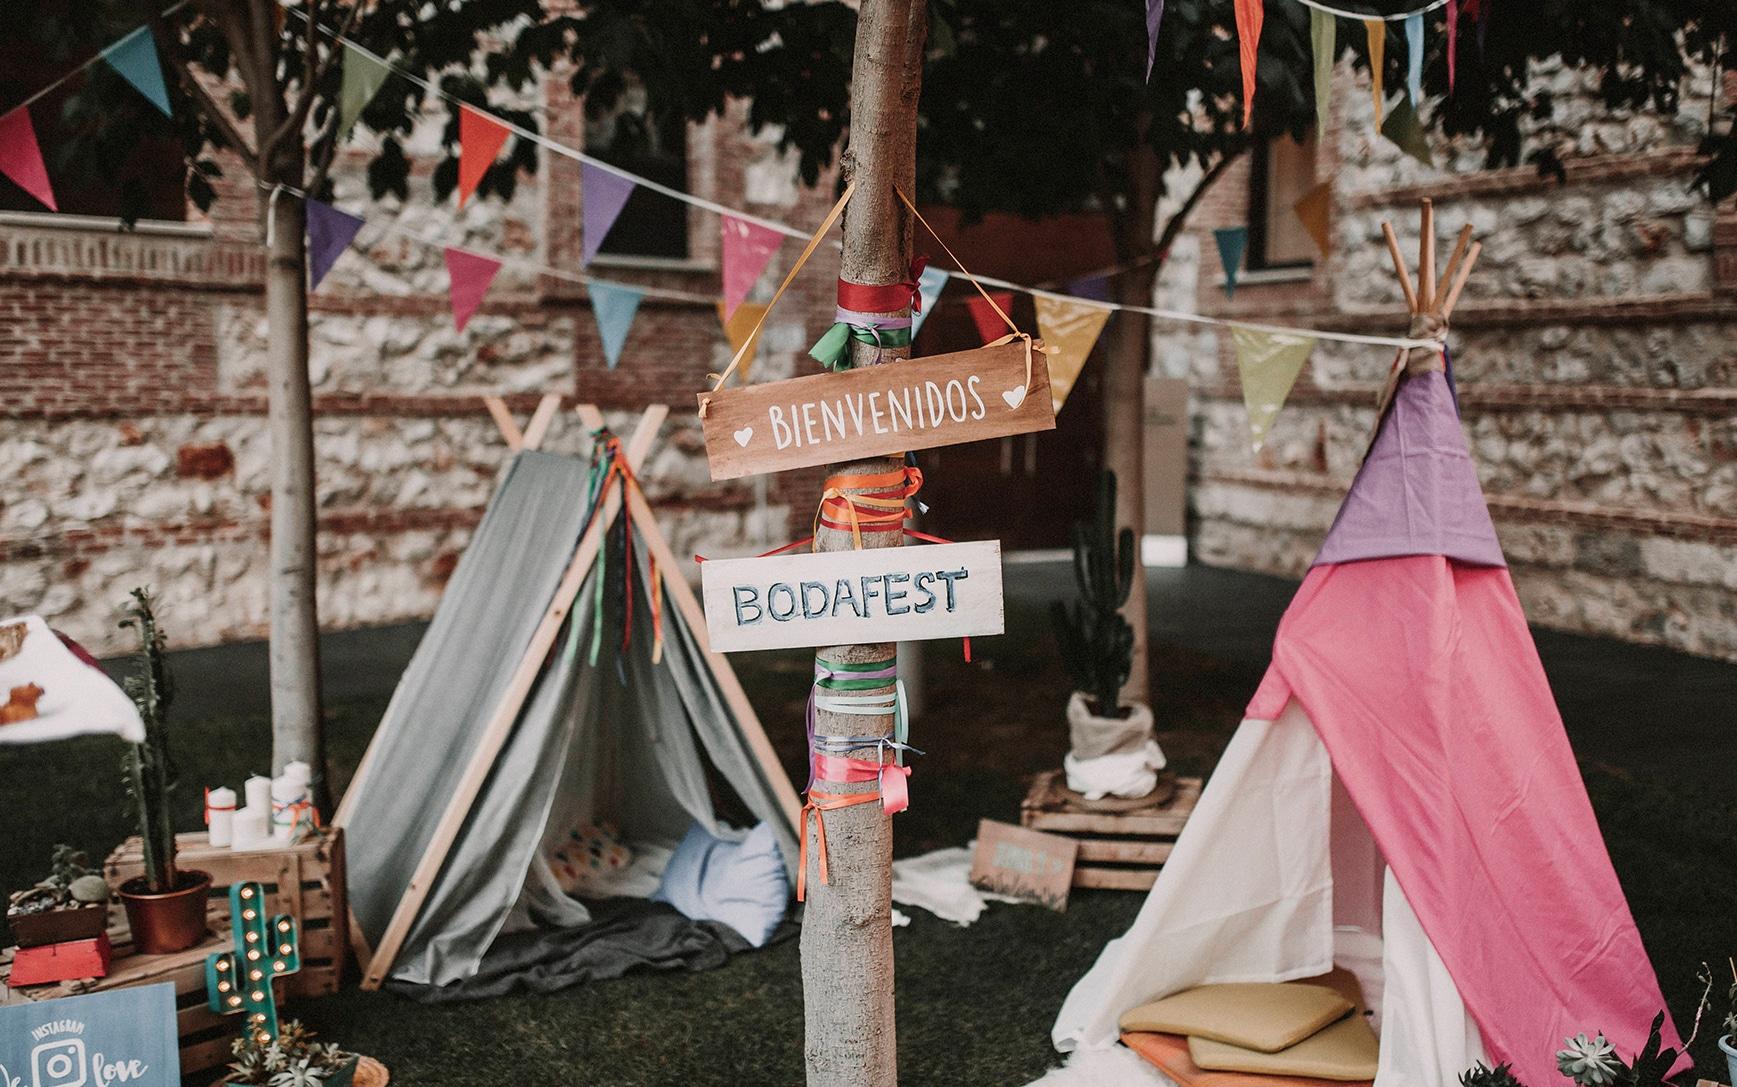 boda festival